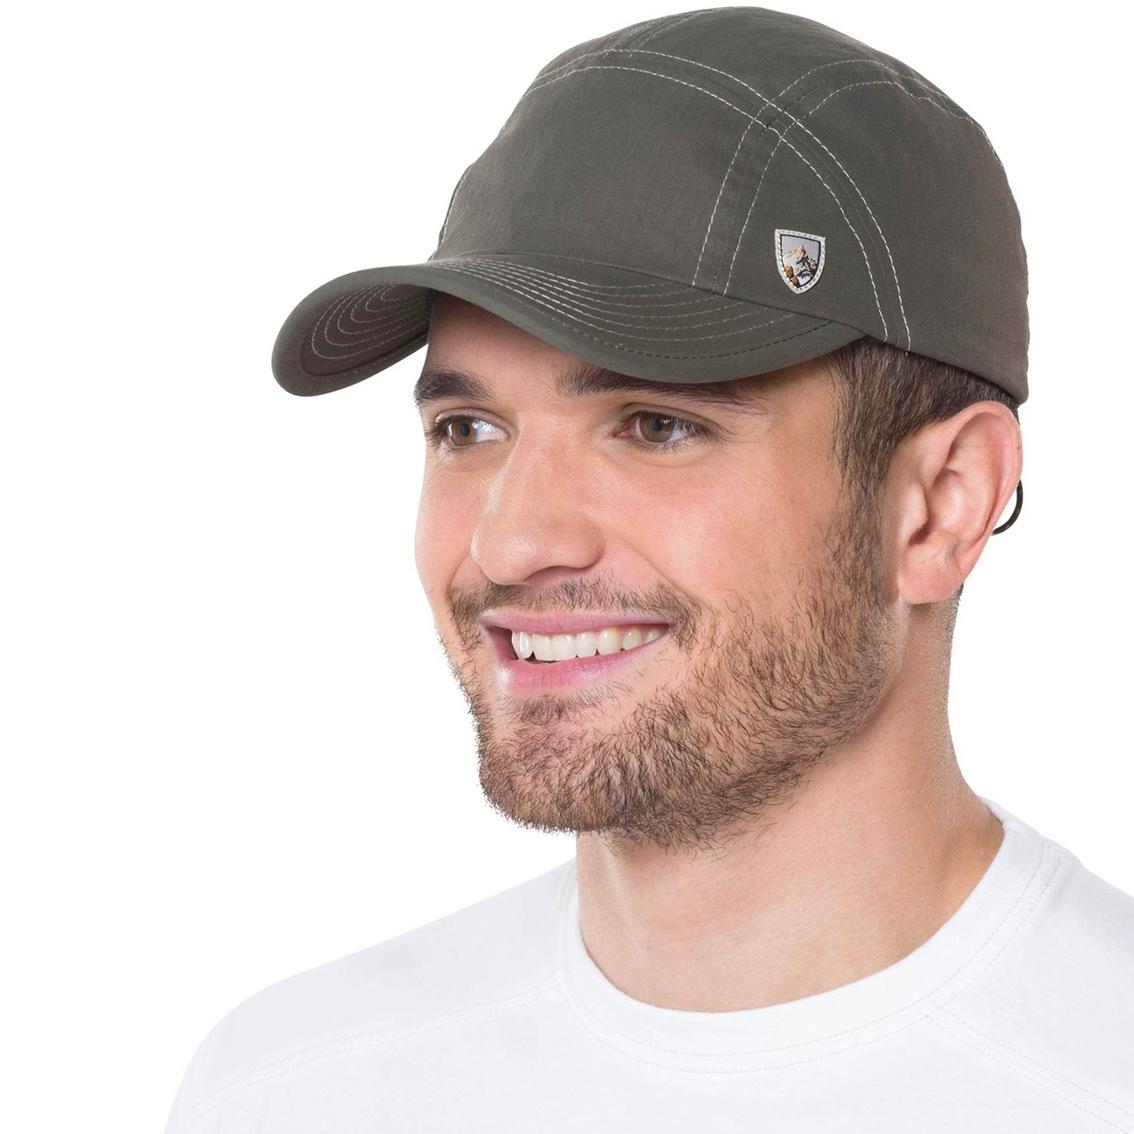 2911b7ad6 Kuhl Uberkuhl Cap | Hats | Apparel | Shop The Exchange